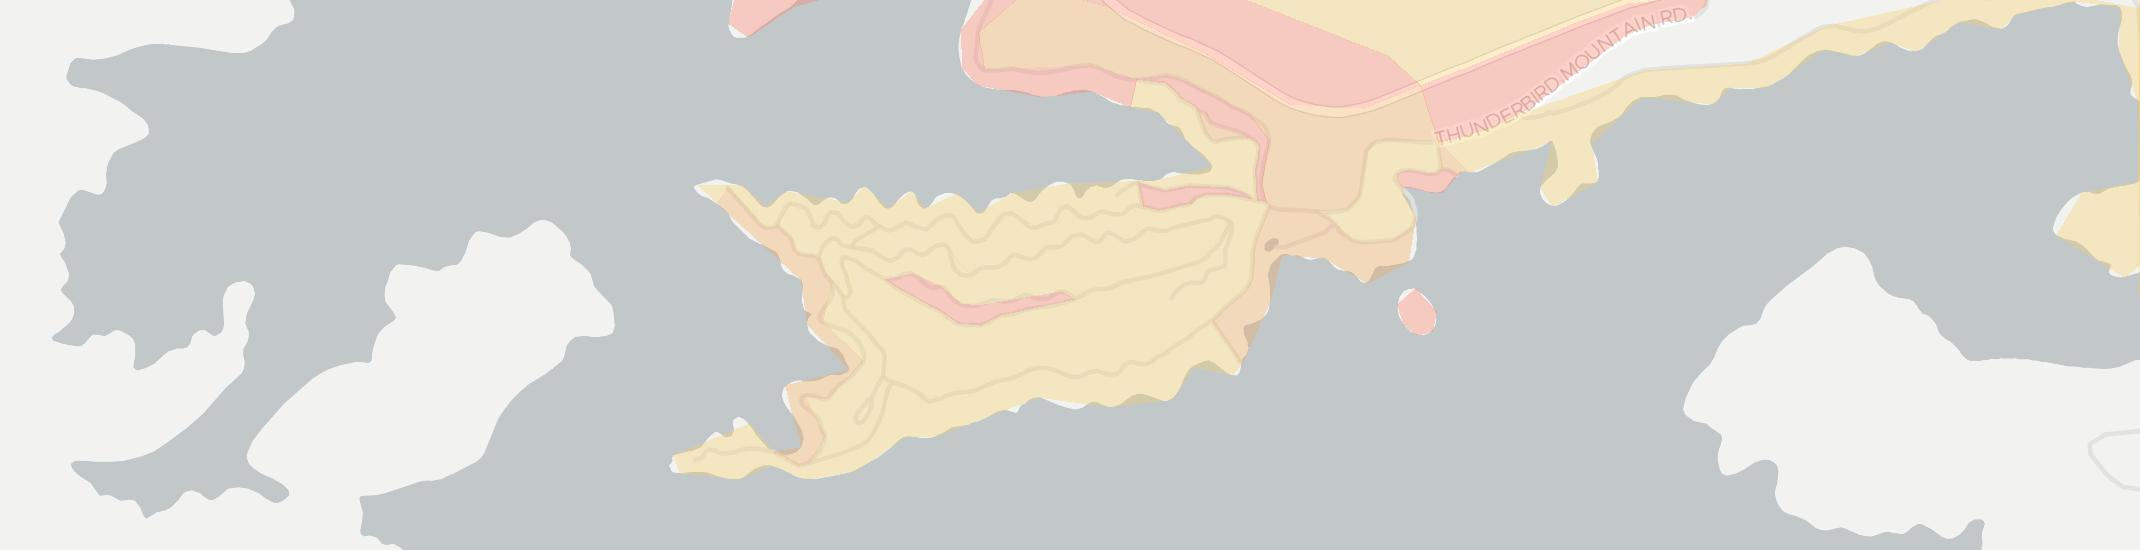 Lake Santeetlah Internet Competition Map. Click for interactive map.